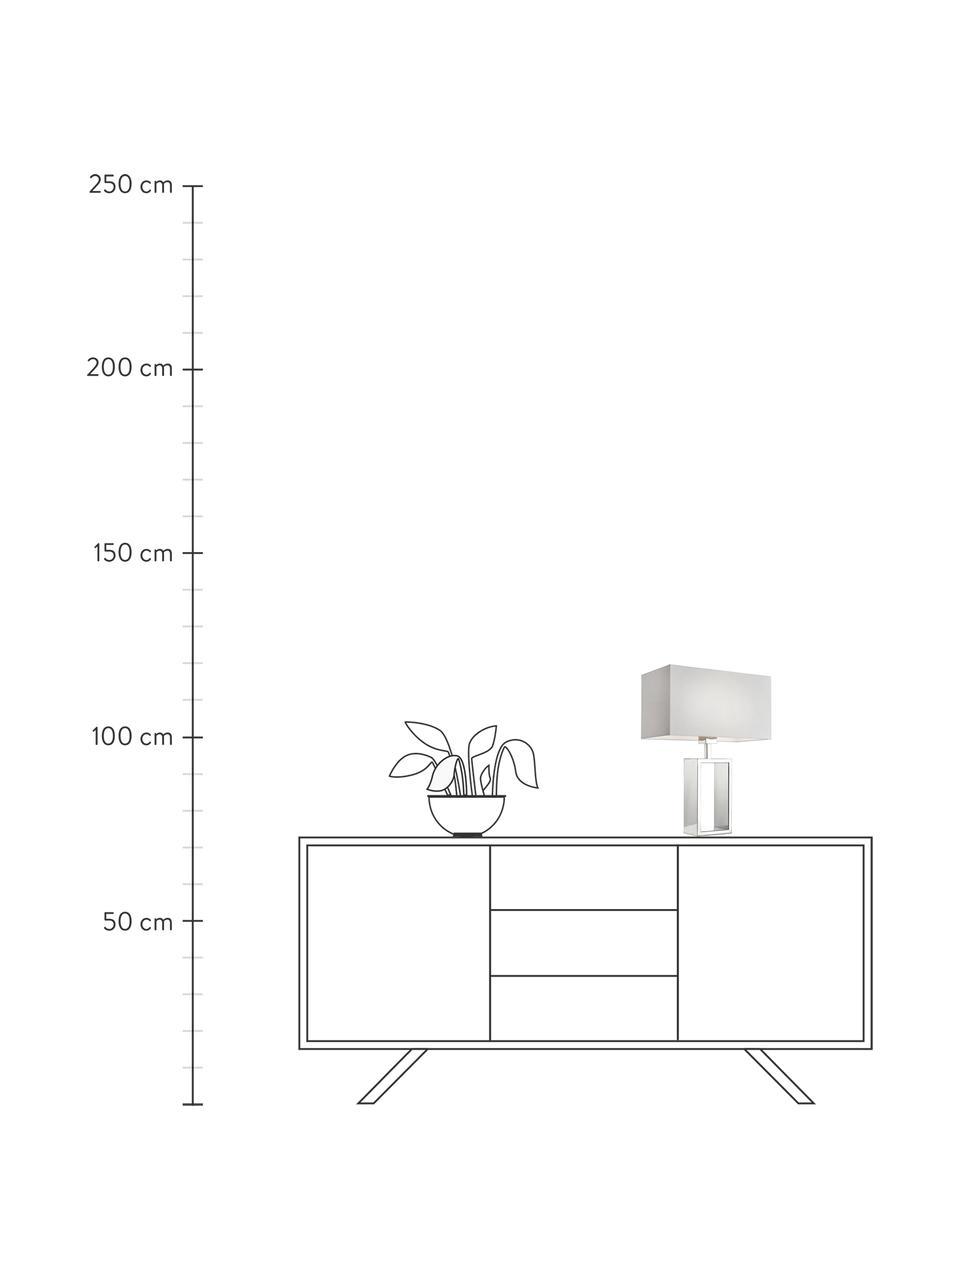 Lampada da tavolo con base in cromo Shanghai, Base della lampada: acciaio inossidabile crom, Cromo, bianco, Larg. 35 x Alt. 47 cm